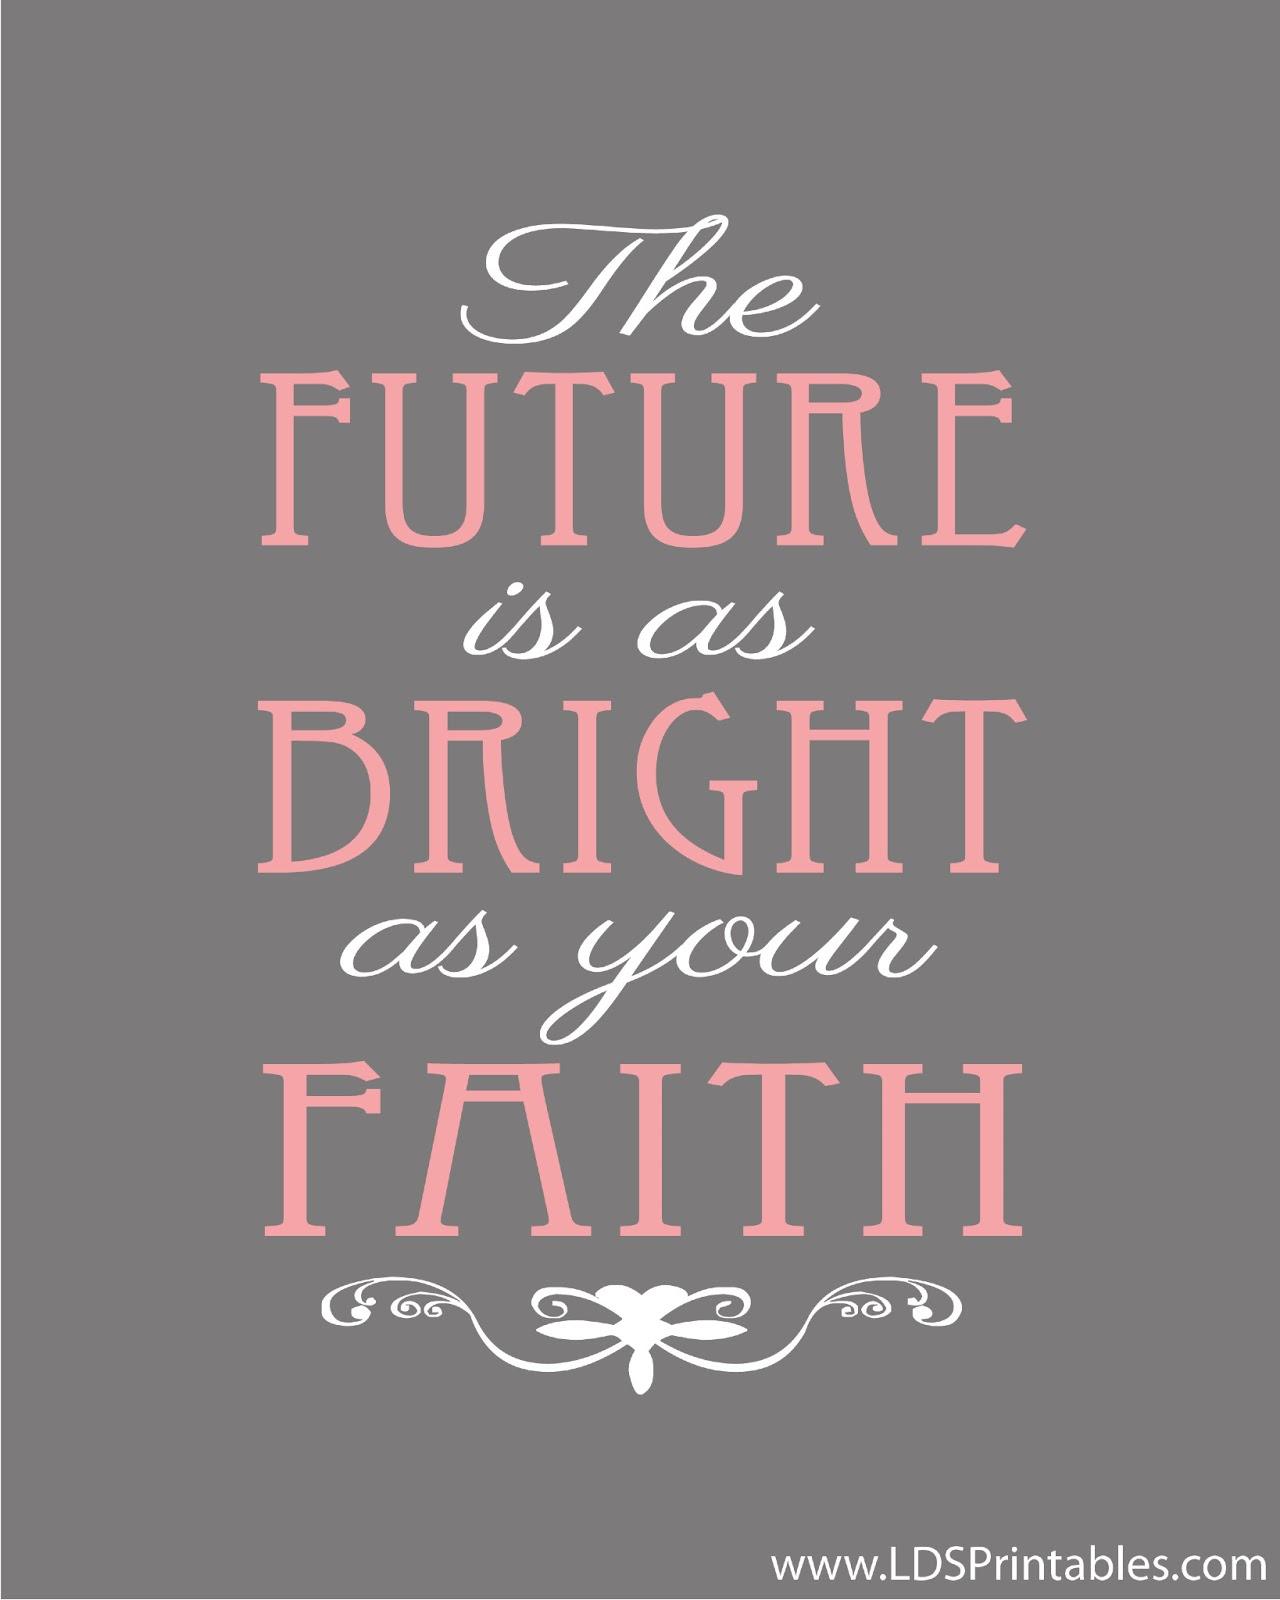 Faith For Future >> Lds Printables The Future Is As Bright As Your Faith